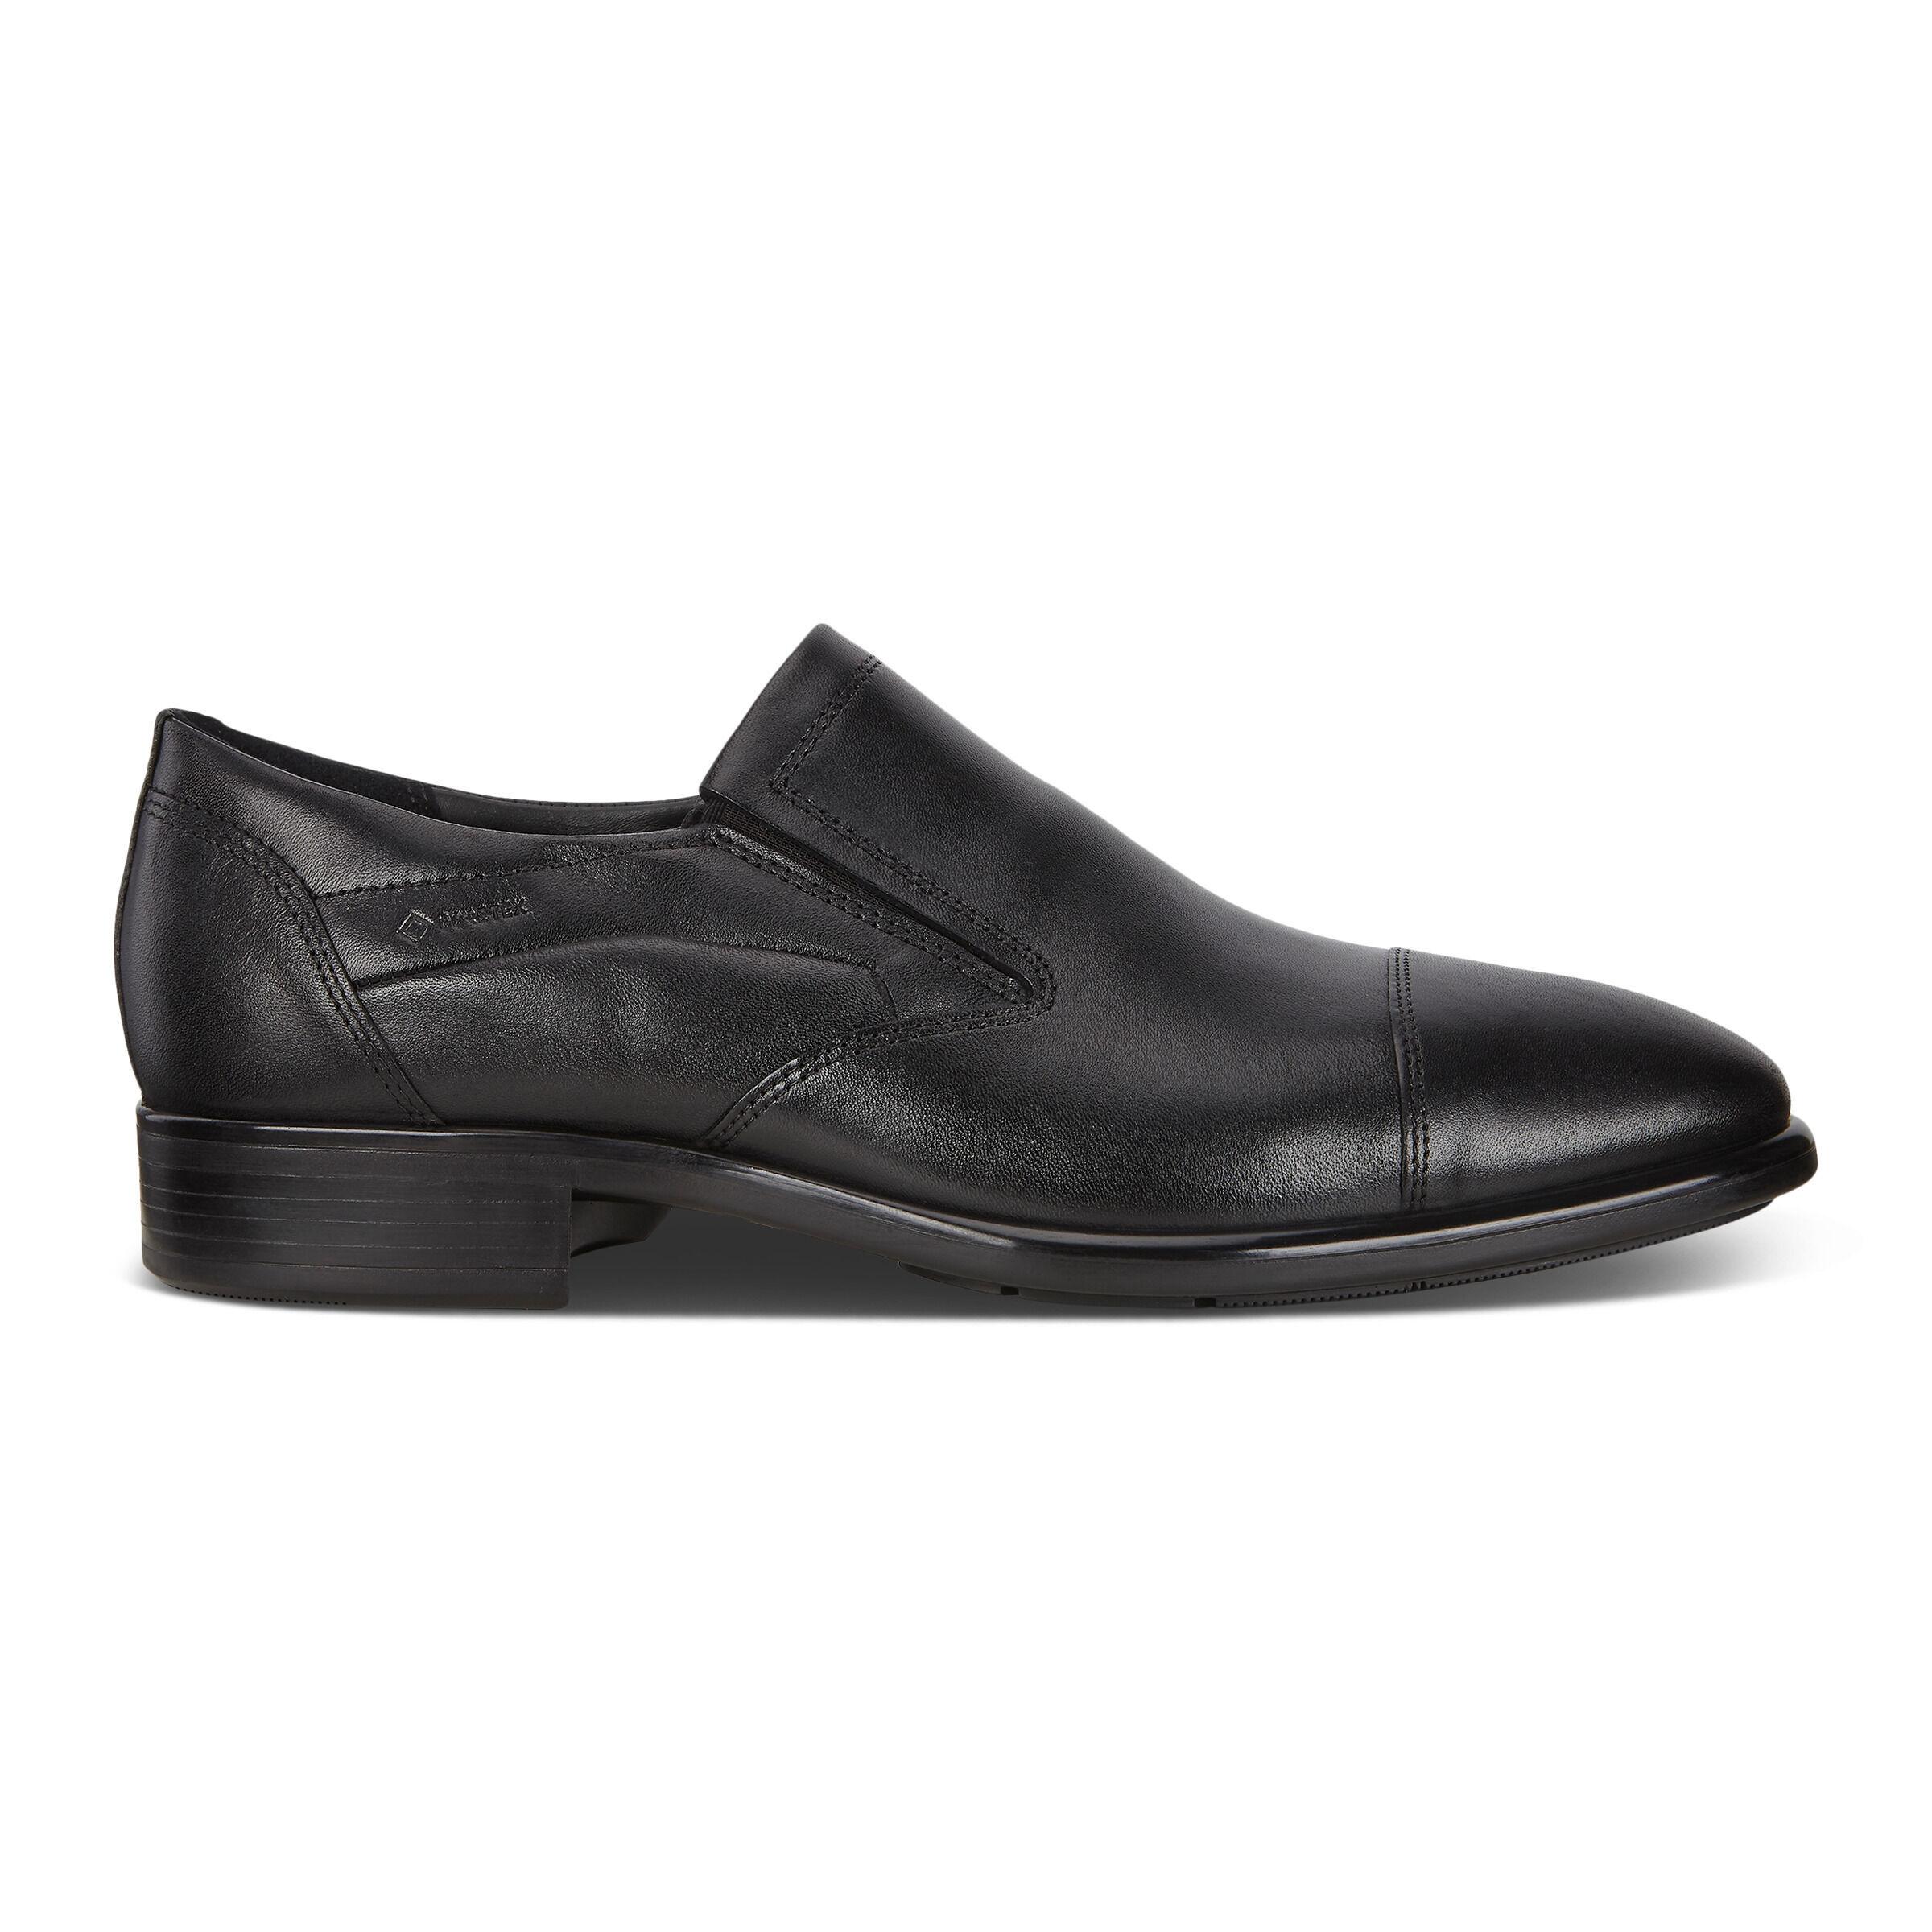 ECCO Citytray Mens Slip-on Shoes: 6 - Black